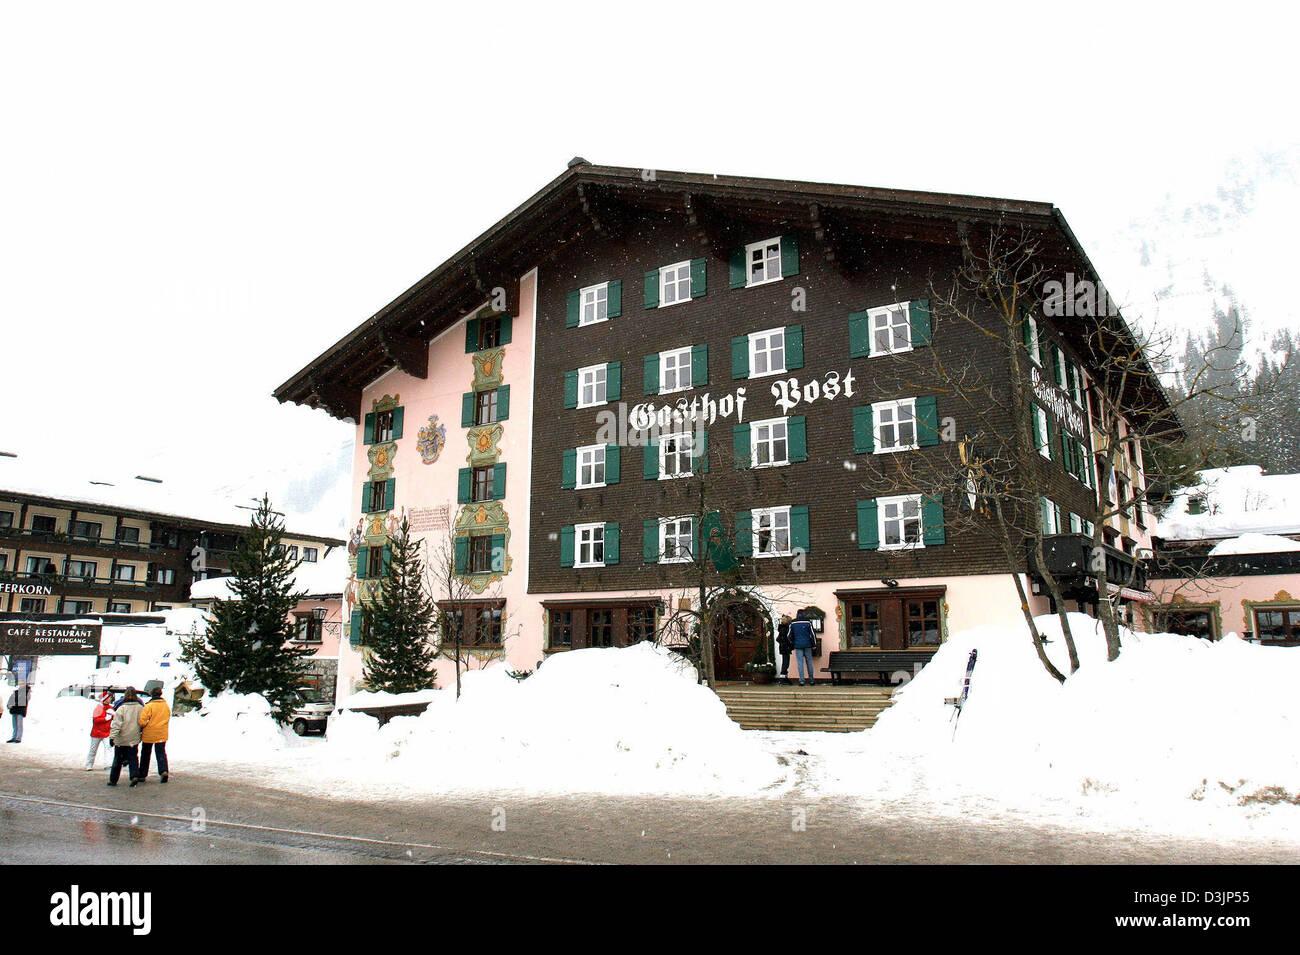 Dpa Gasthof Post Hotel Post Pictured In Lech Austria